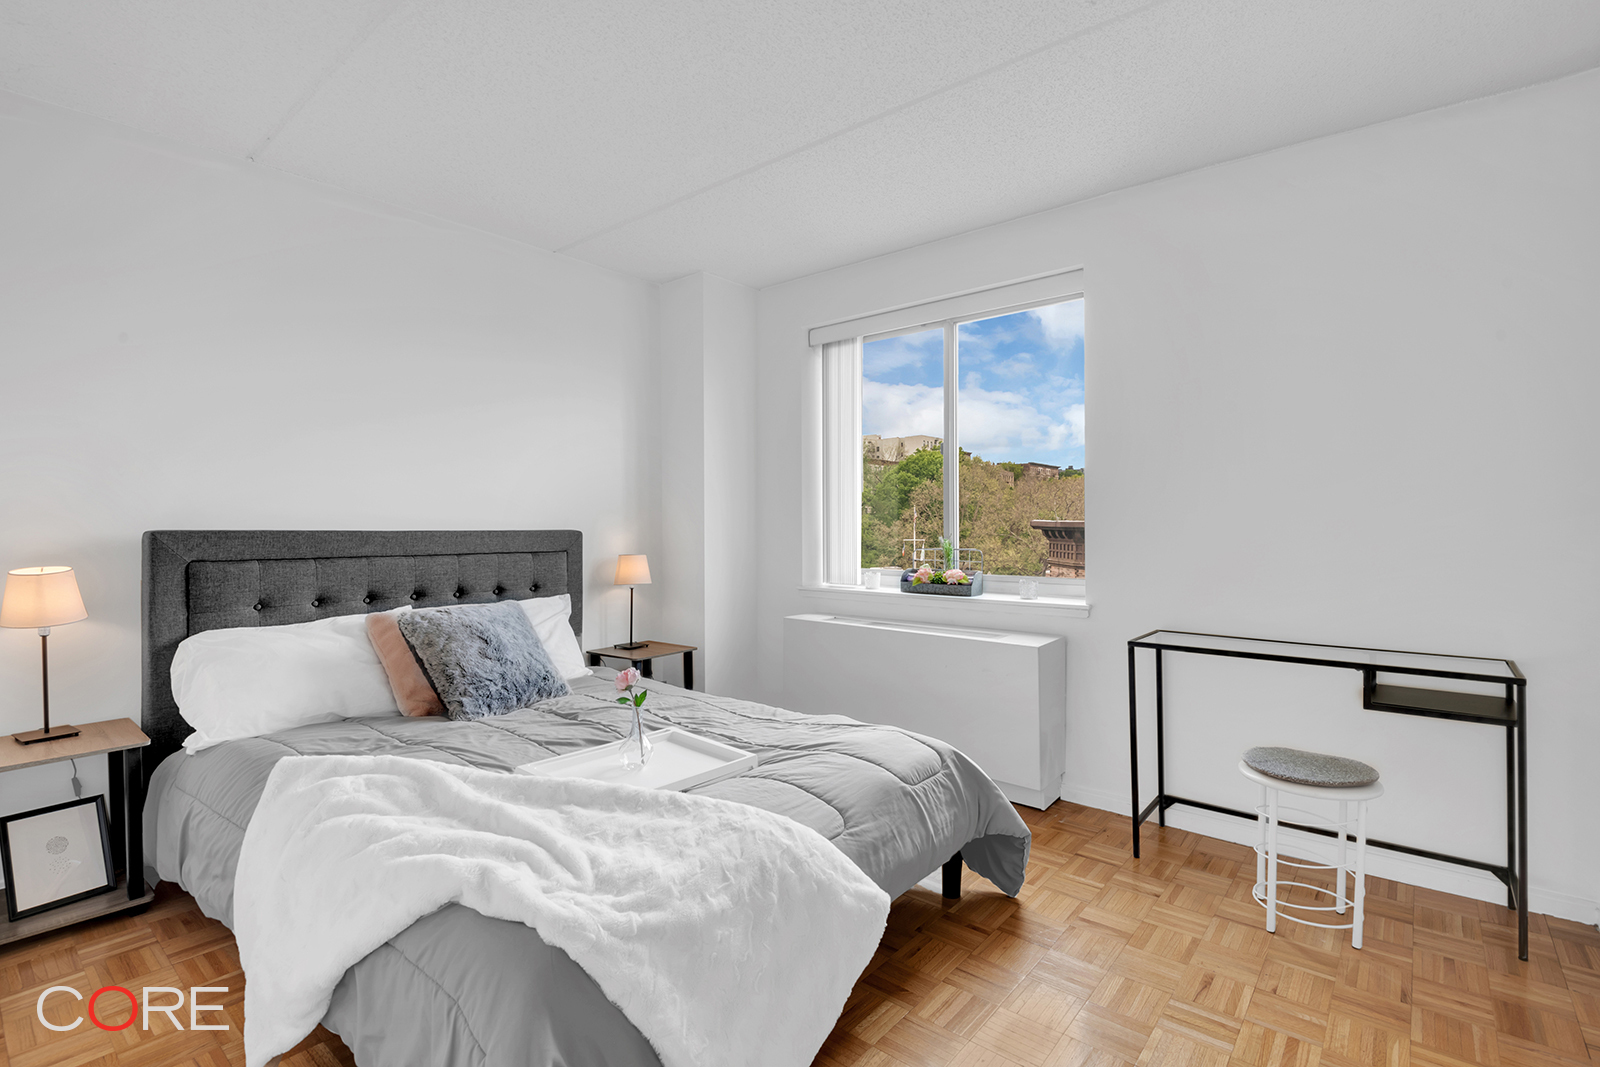 68 Bradhurst Avenue West Harlem New York NY 10039